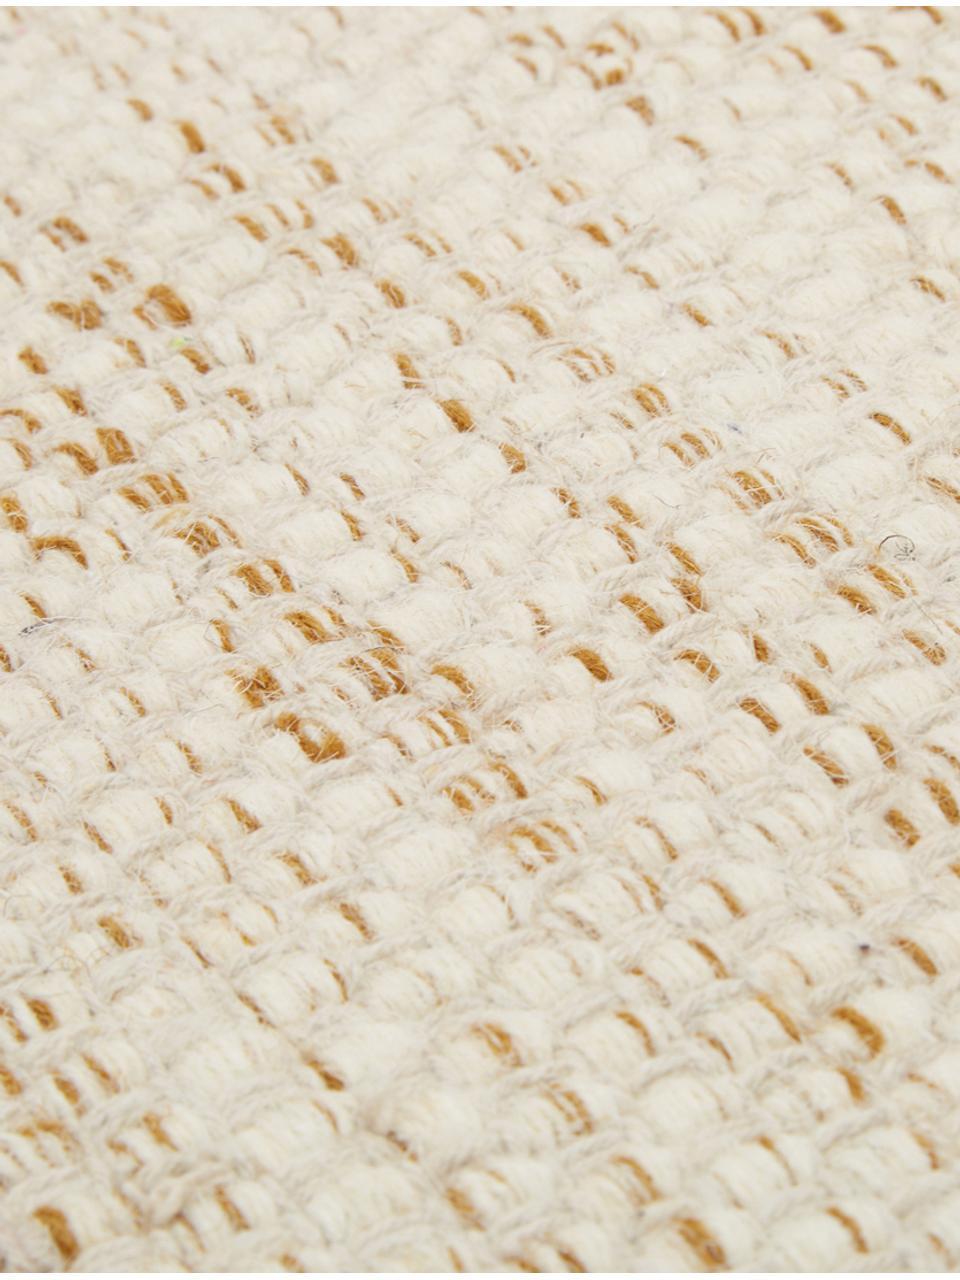 Handgeweven wollen vloerkleed Lule met kleurverloop in beige/geel, 70% wol, 30% katoen, Okergeel, beige, B 200 x L 300 cm (maat L)